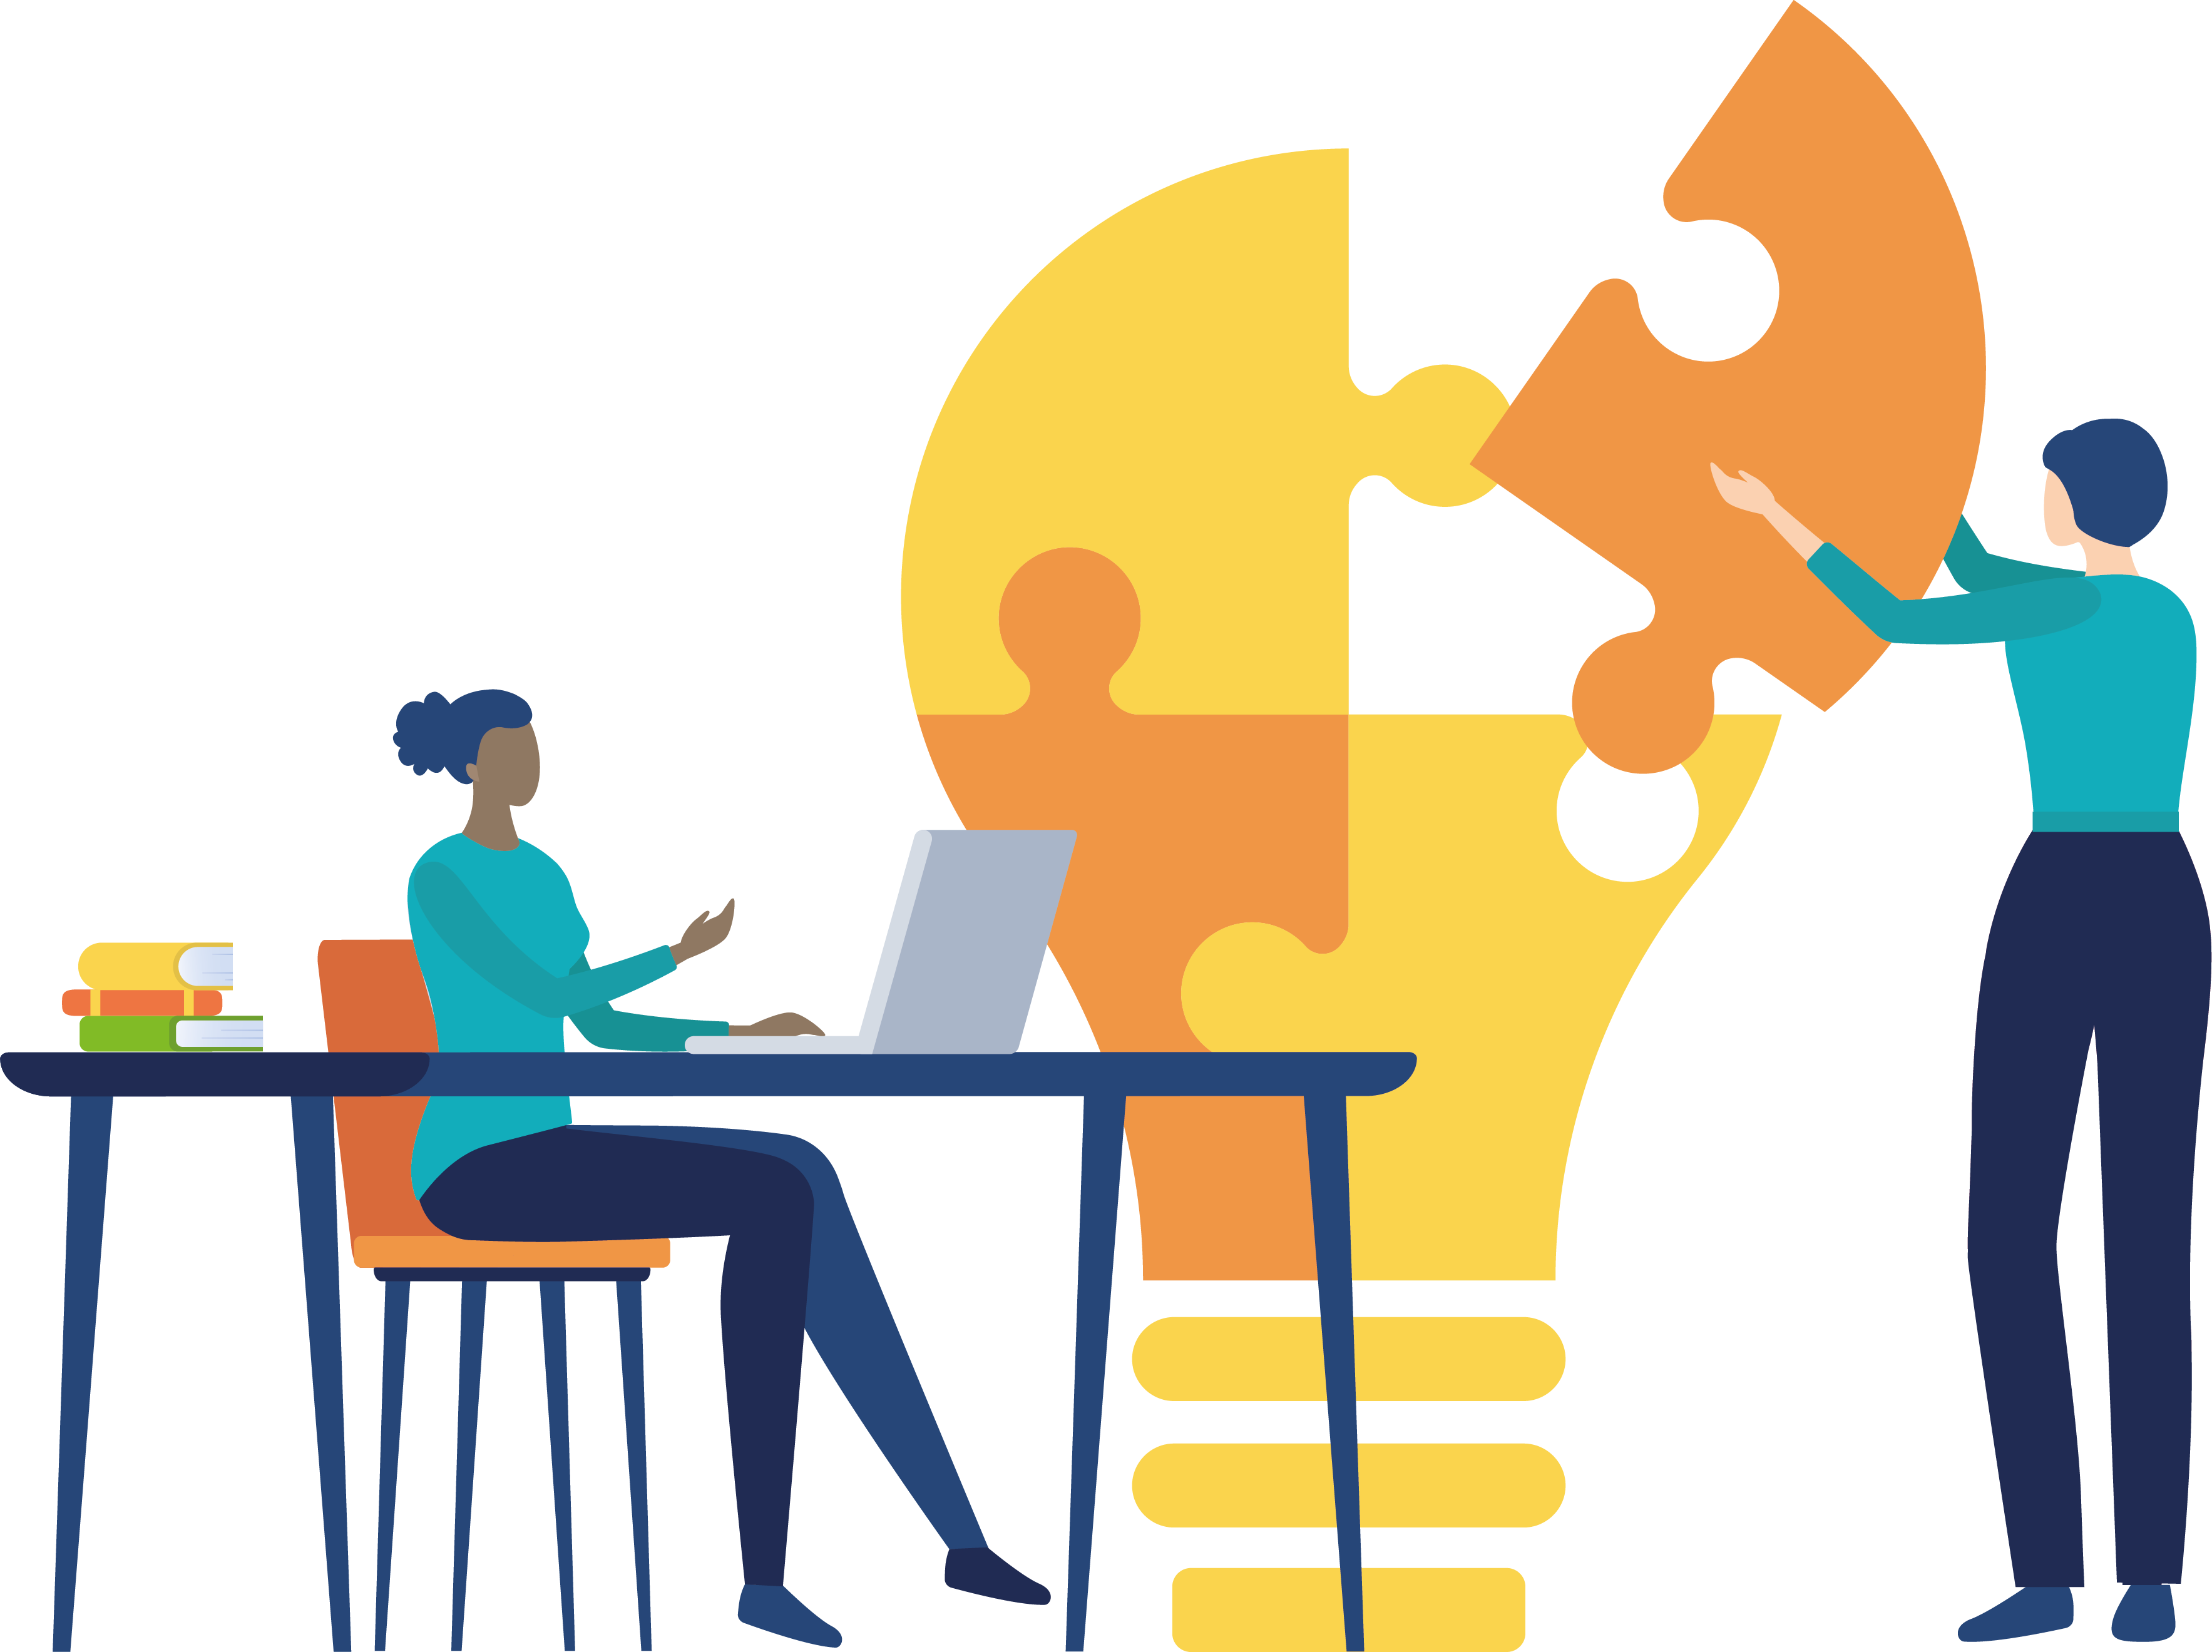 illustration of 2 people building a light bulb